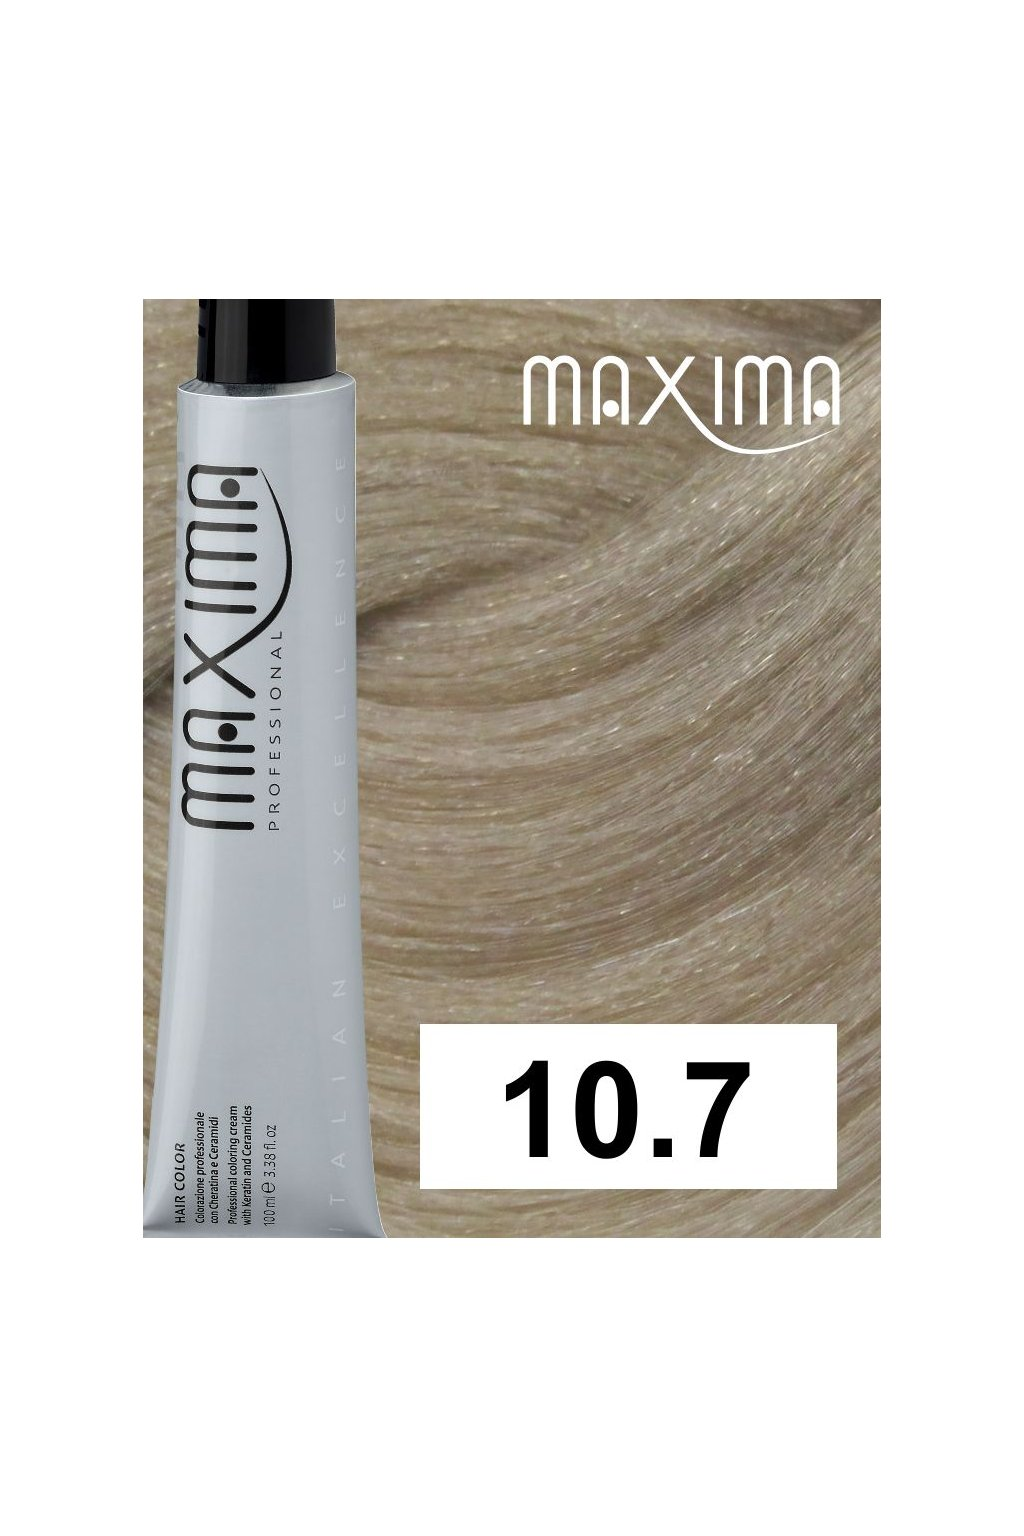 10 7 max